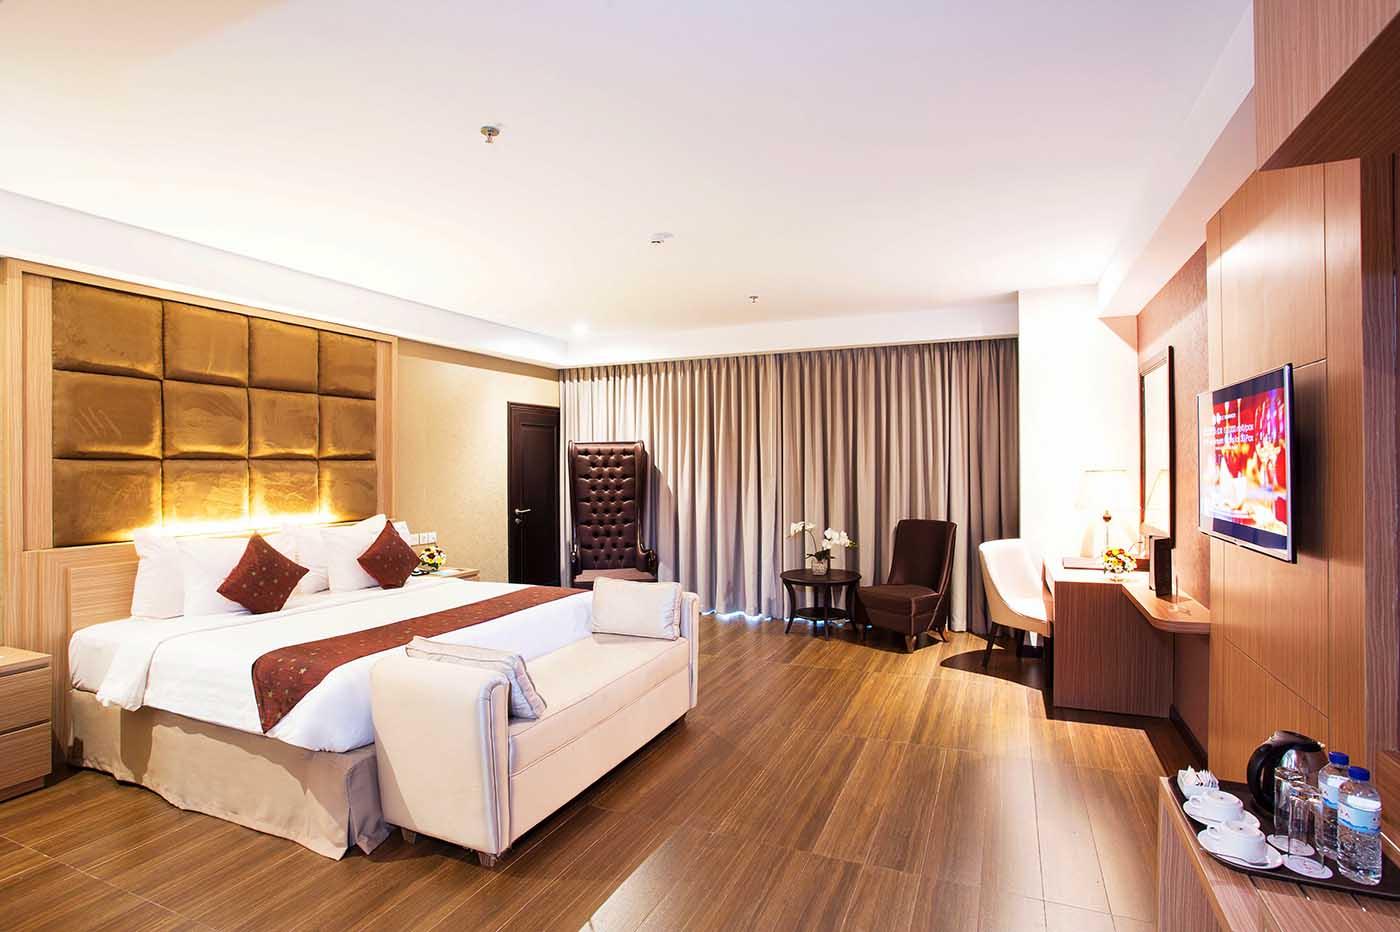 TARA Hotel yang simpel dan elegant di Kota Yogyakarta Indonesia